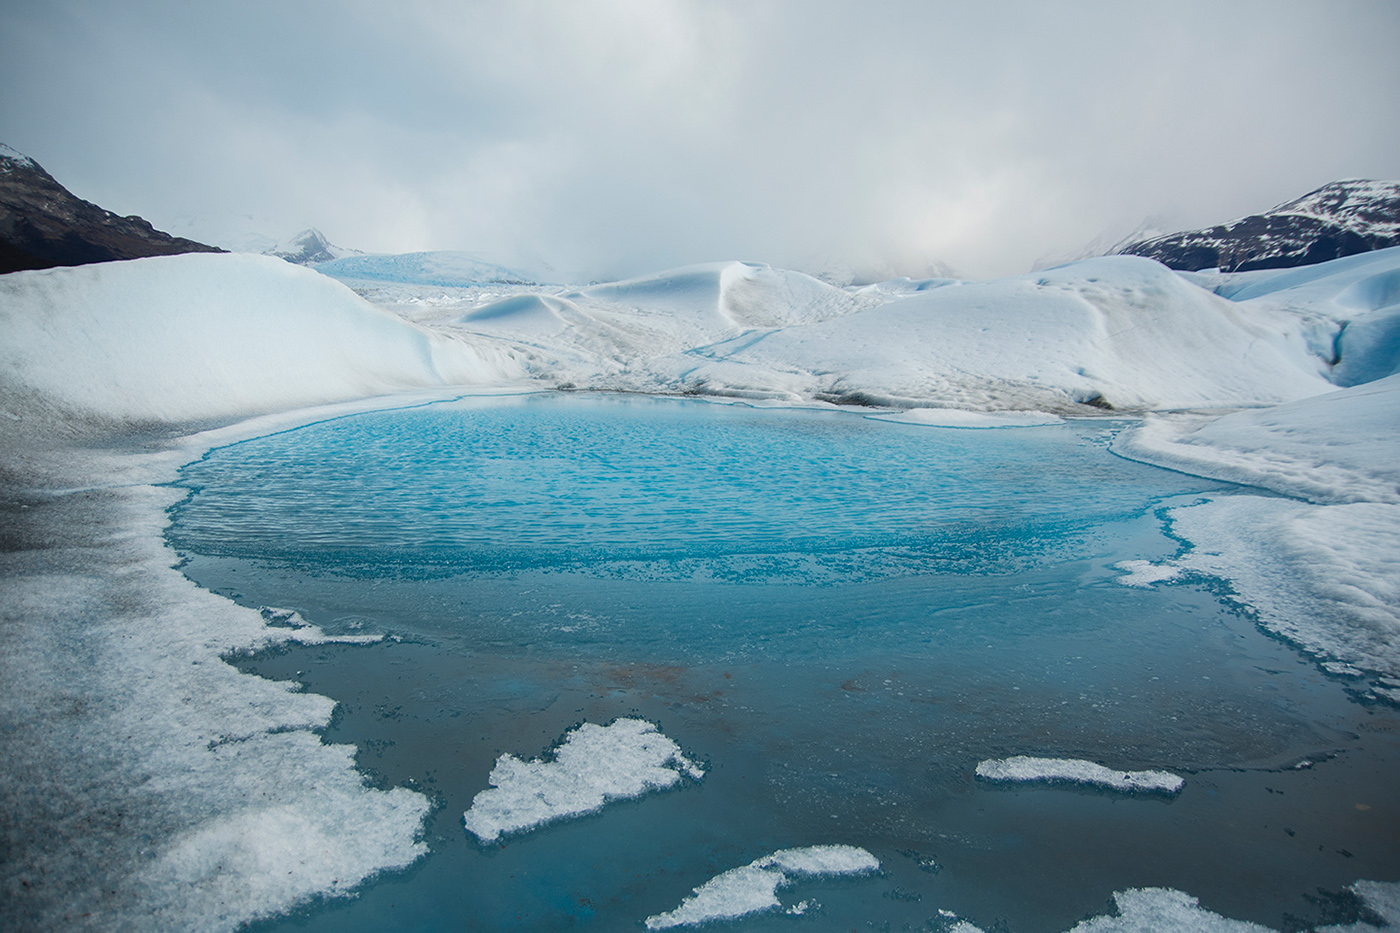 Sobre el glaciar